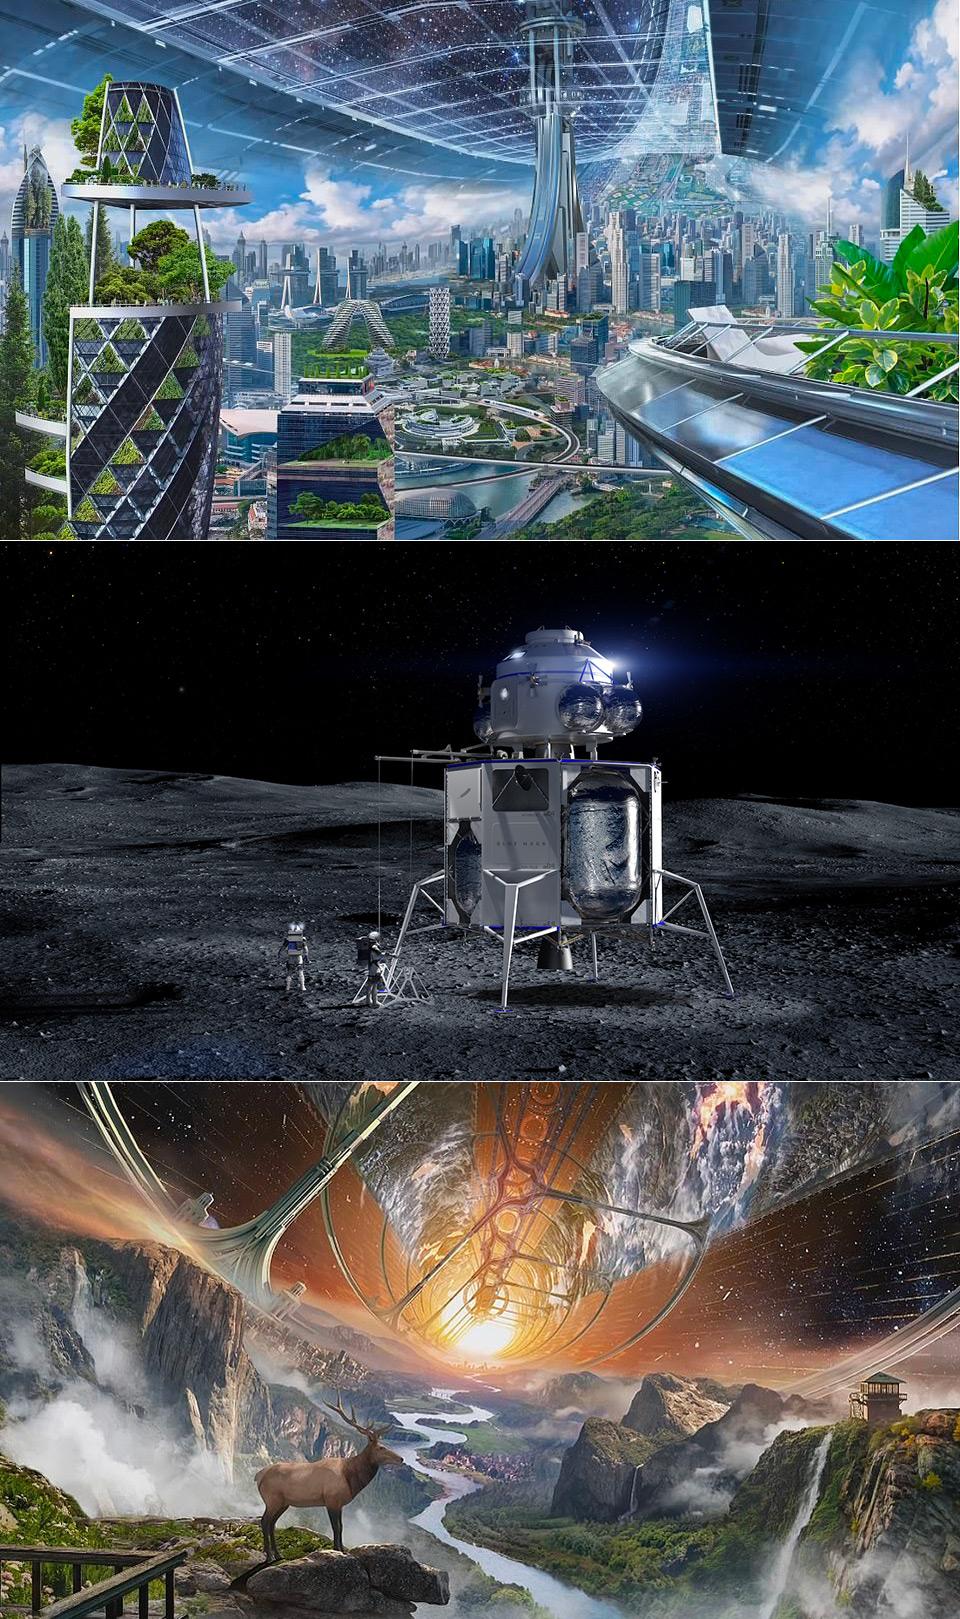 Jeff Bezos Ring World Space Habitat Amazon